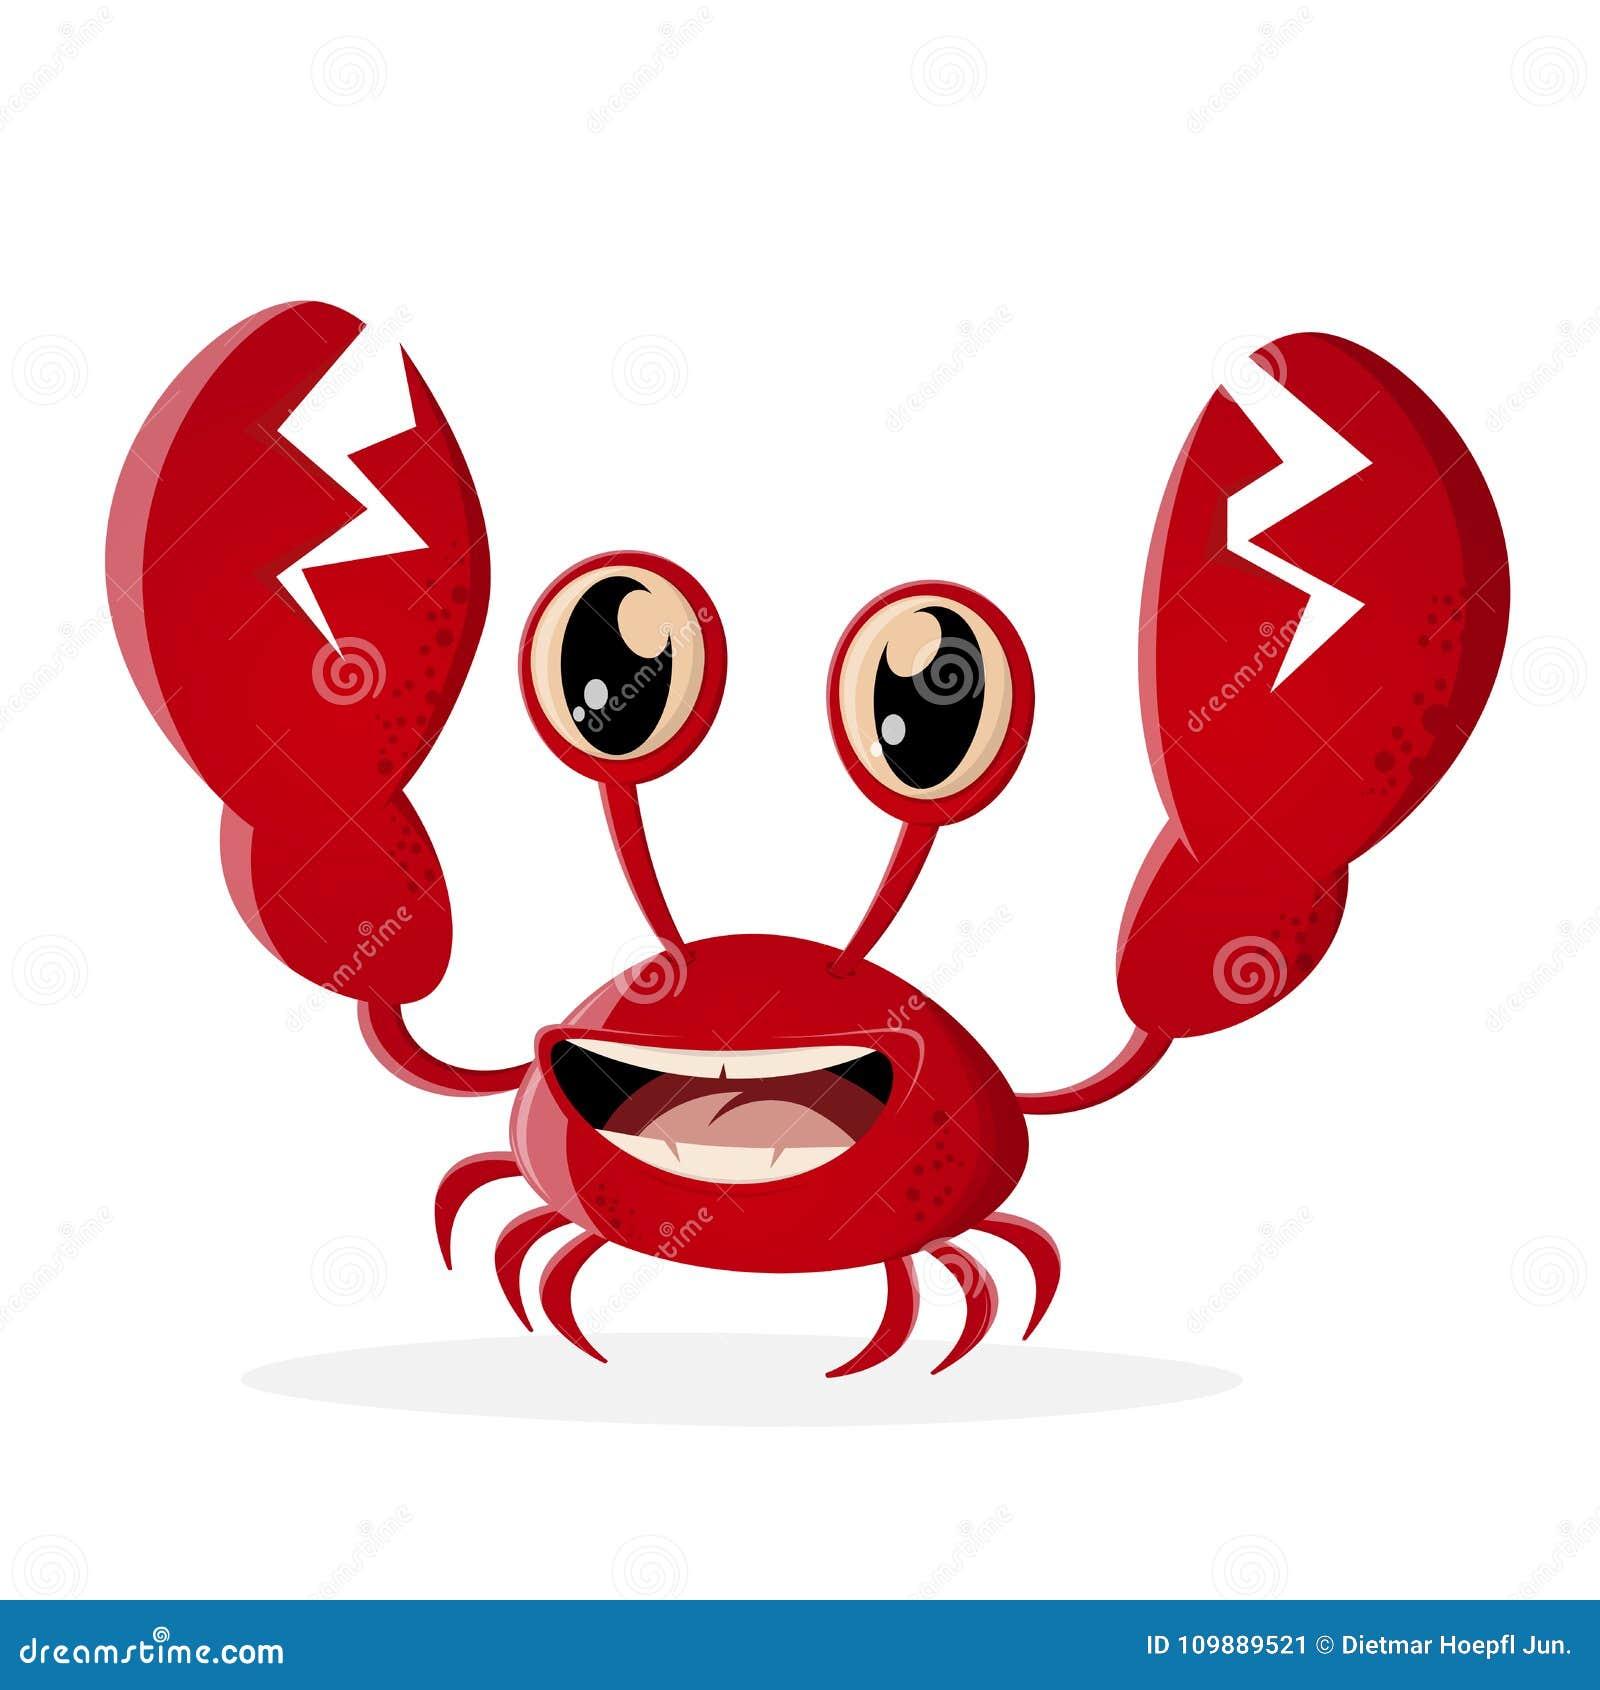 Big Image Crab Clipart Image Provided - EpiCentro Festival   1390x1300